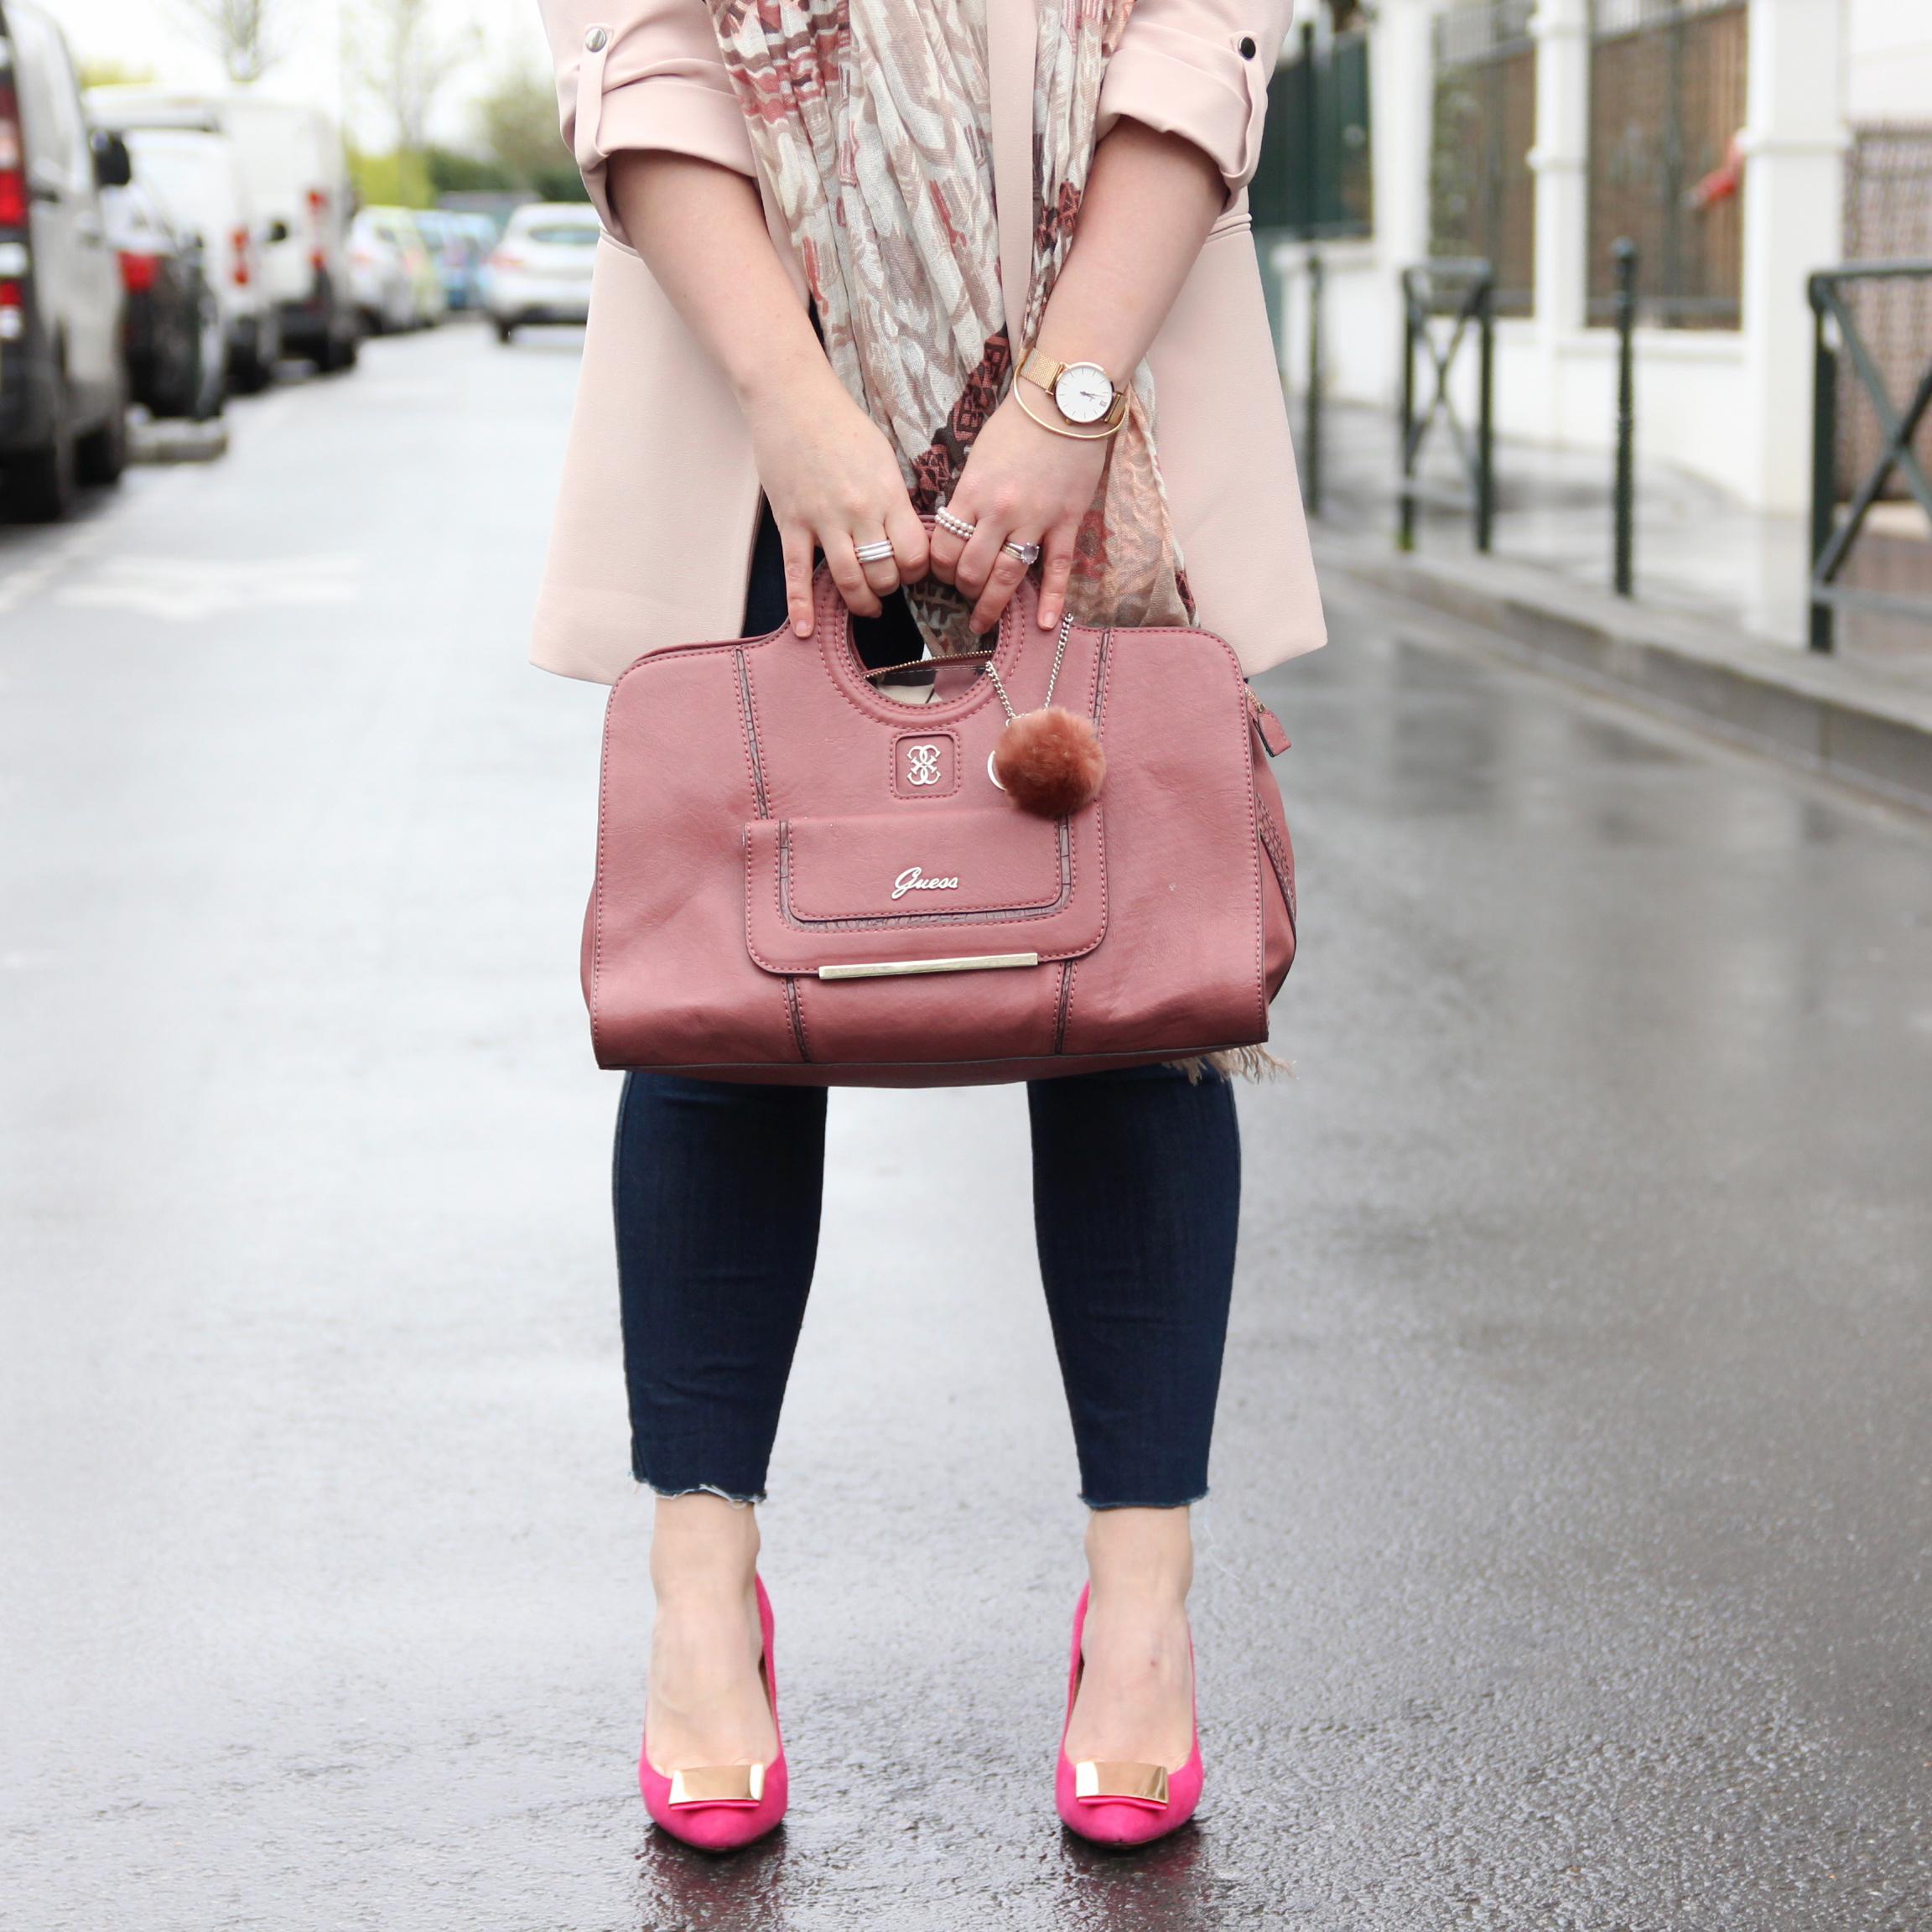 fashionblogger-influencer-jacket-zara-rosepastel-paris-seralynepointcom-2017-03-21 120306